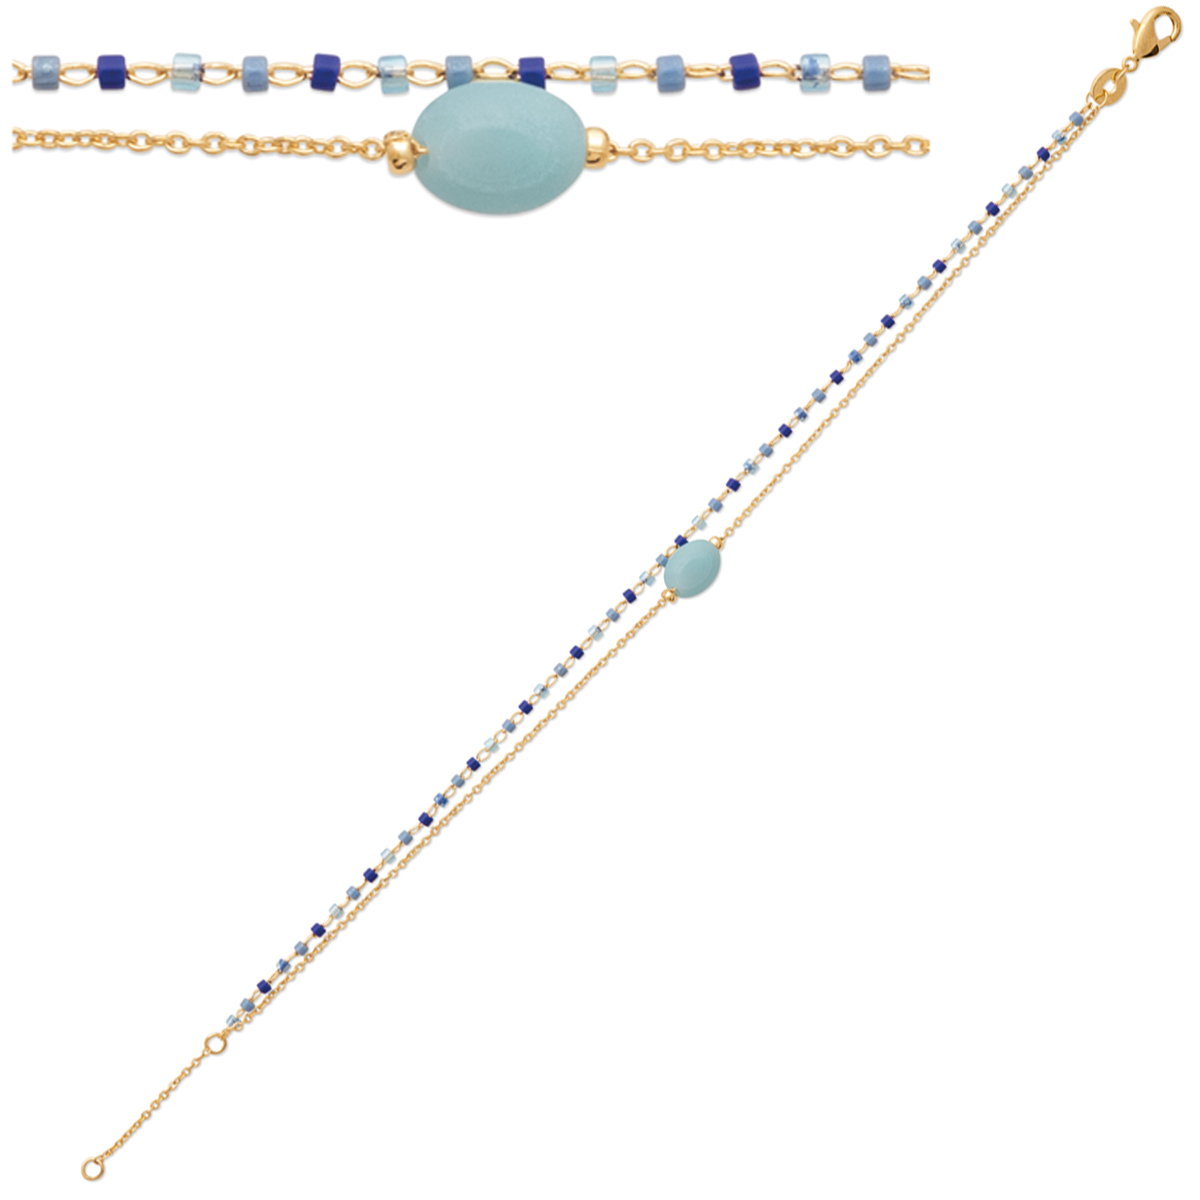 Bracelet Plaqué Or \'Boho\' amazonite doré (2 rangs) - 8x6 mm - [R1113]